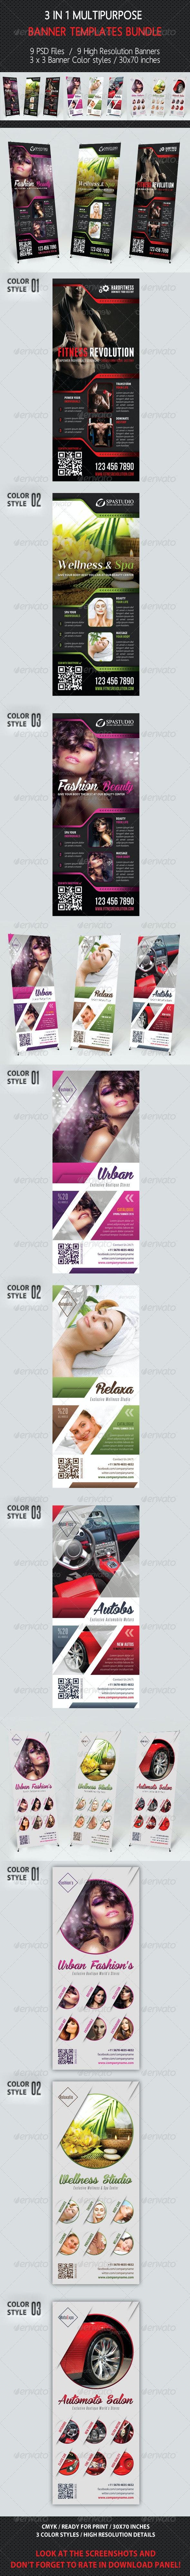 3 in 1 Multipurpose Banner  Bundle 01 - Signage Print Templates